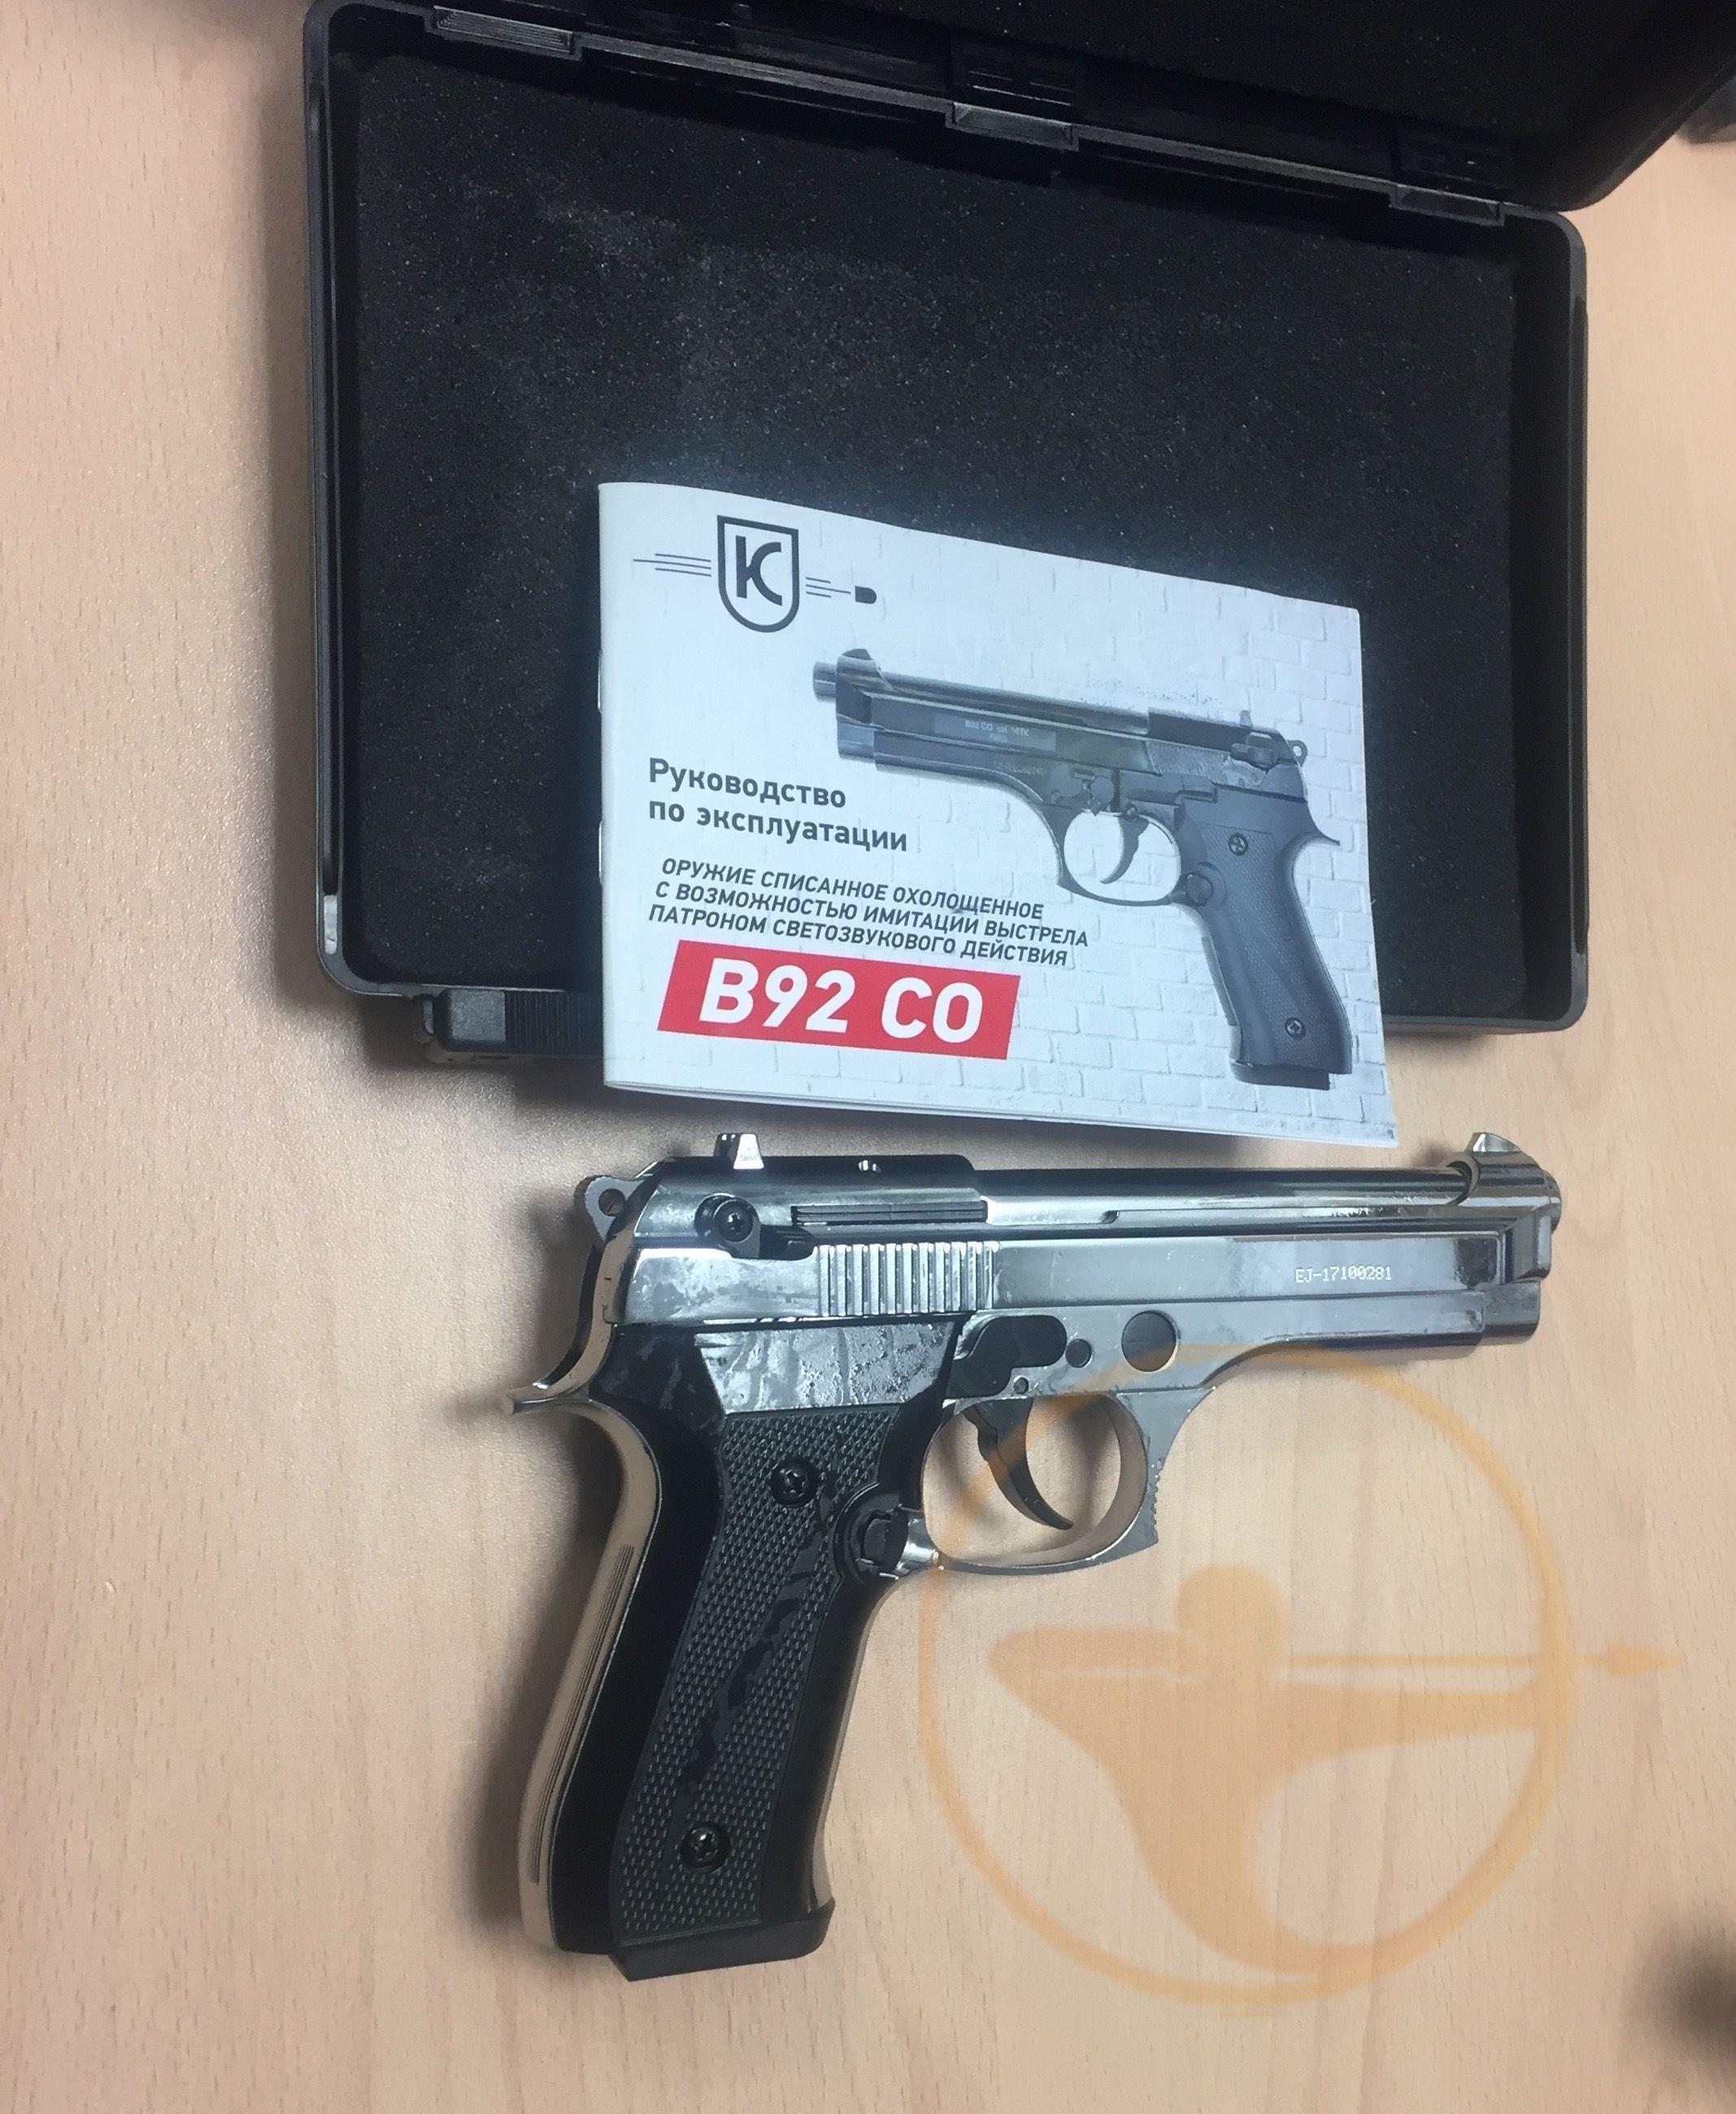 Охолощенный пистолет Beretta B92-СО Хром, 10ТК